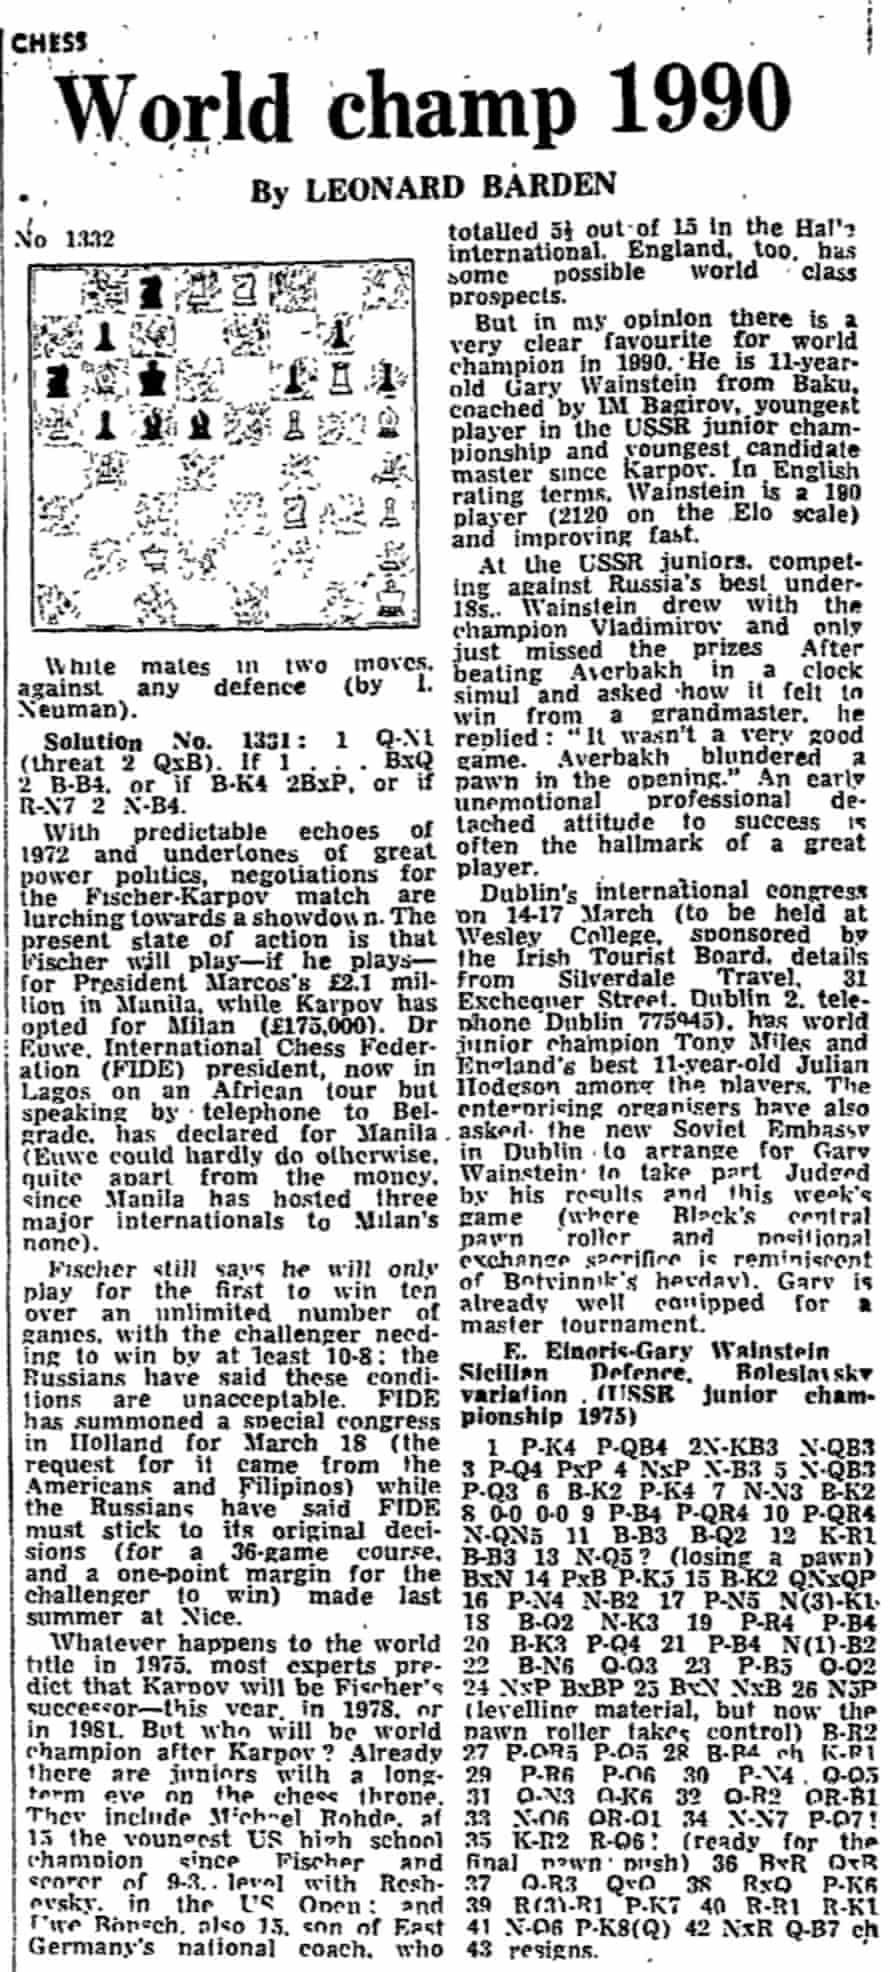 Leonard Barden 1975 article